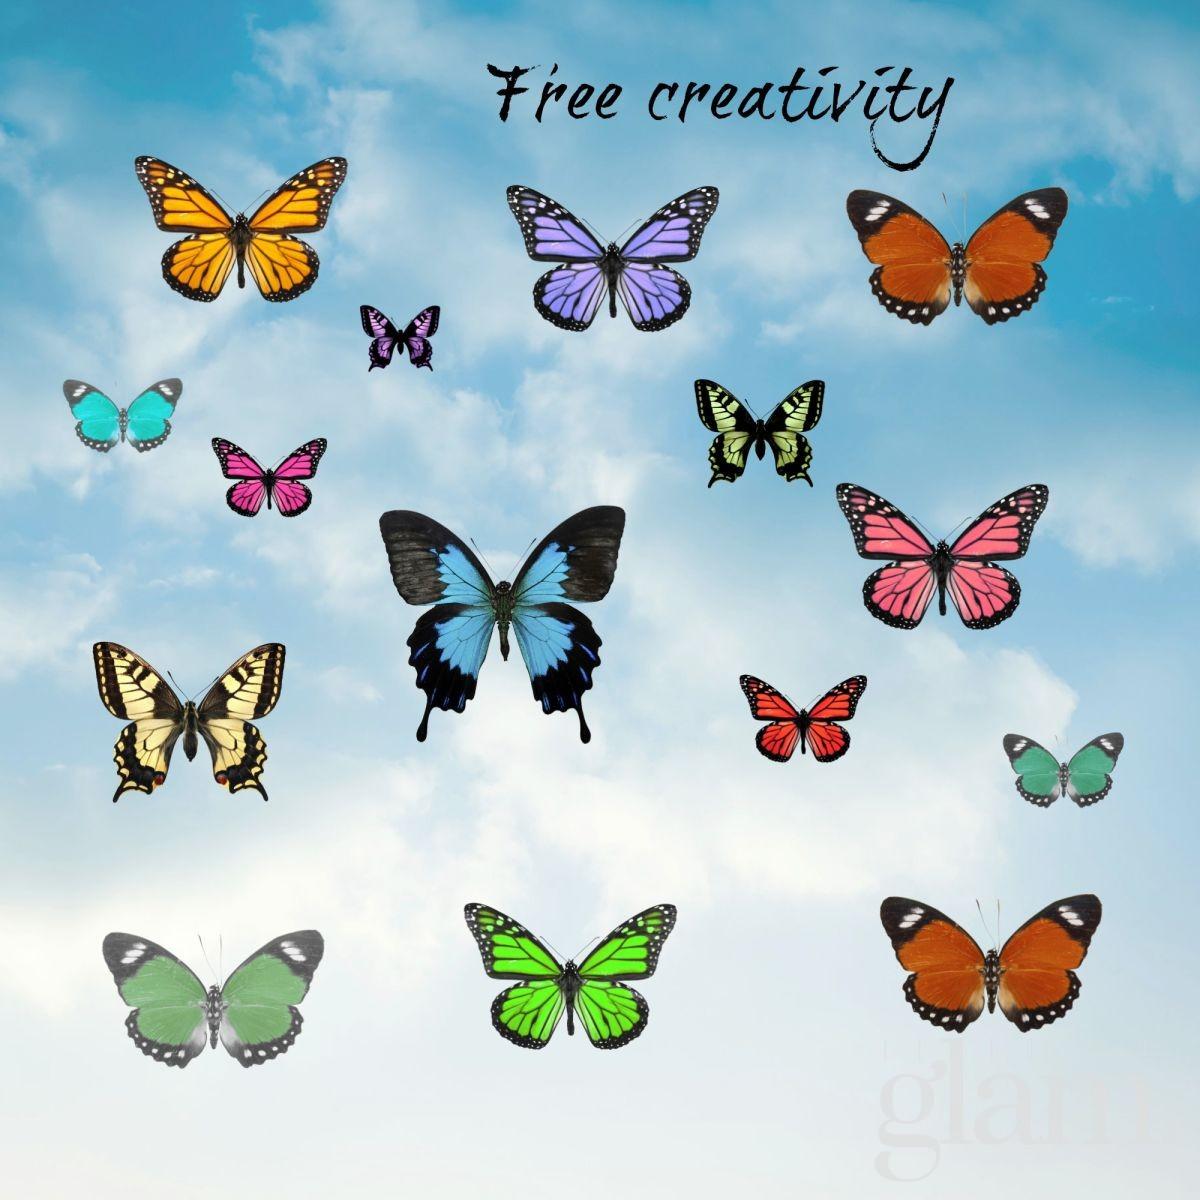 free creativity